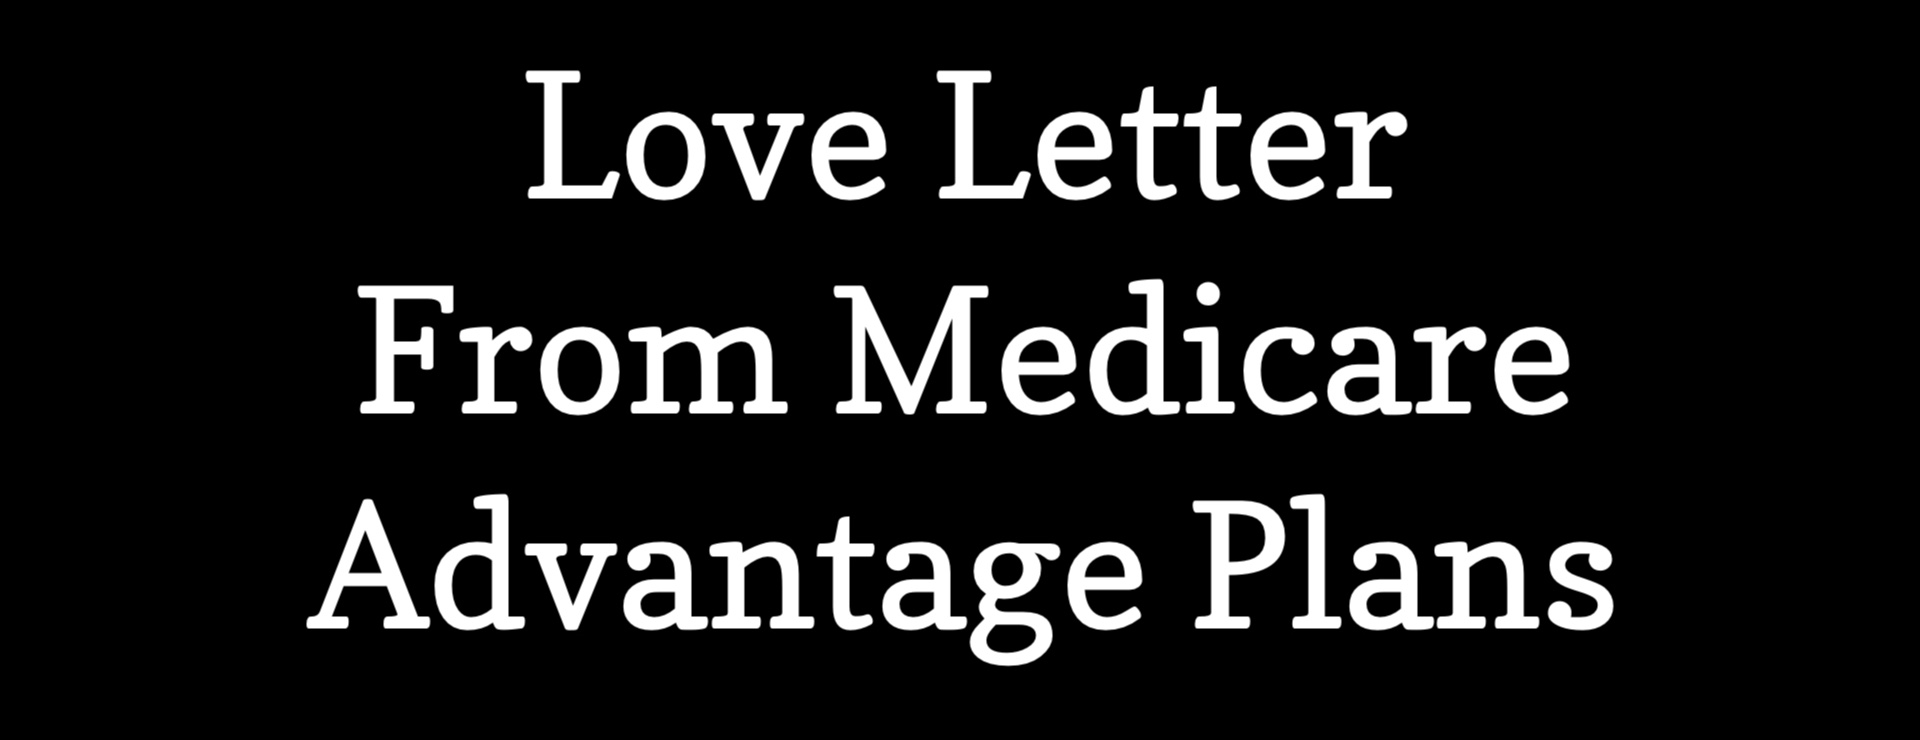 From Jack's Desk #39: Love Letter From Medicare Advantage Plans